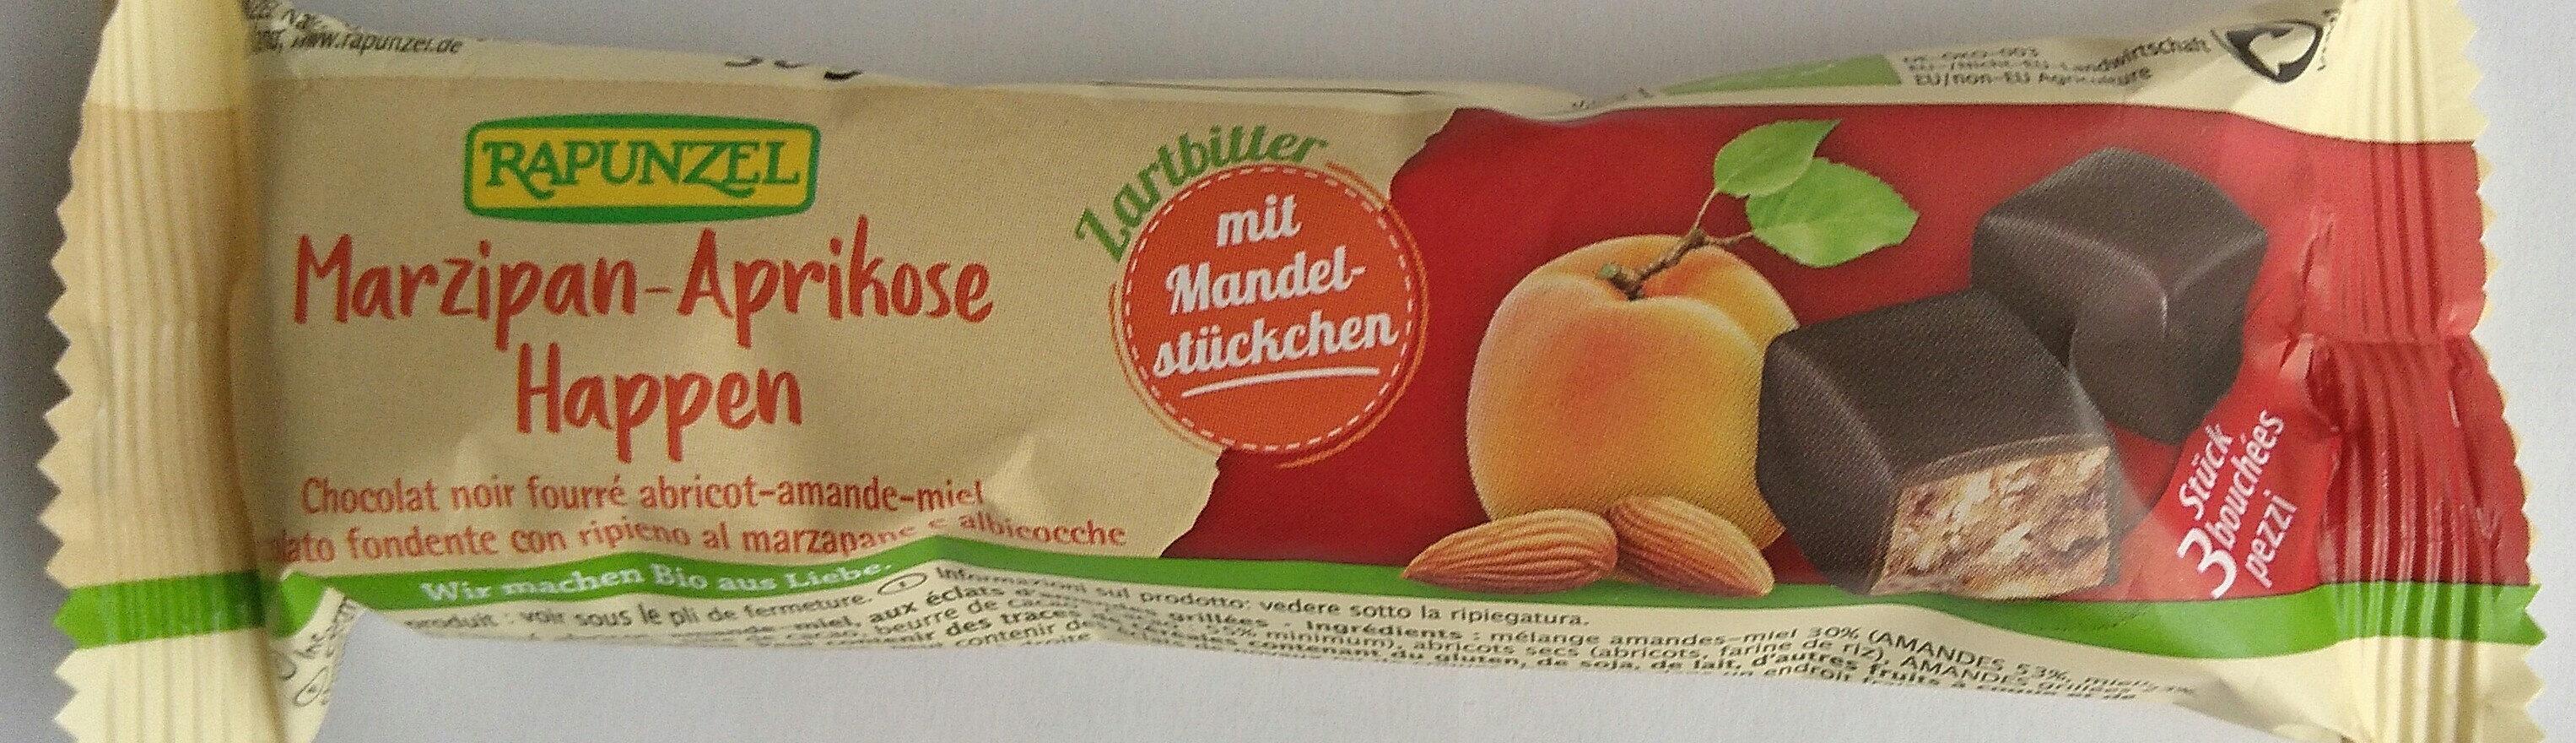 Marzipan-Aprikose Happen - Product